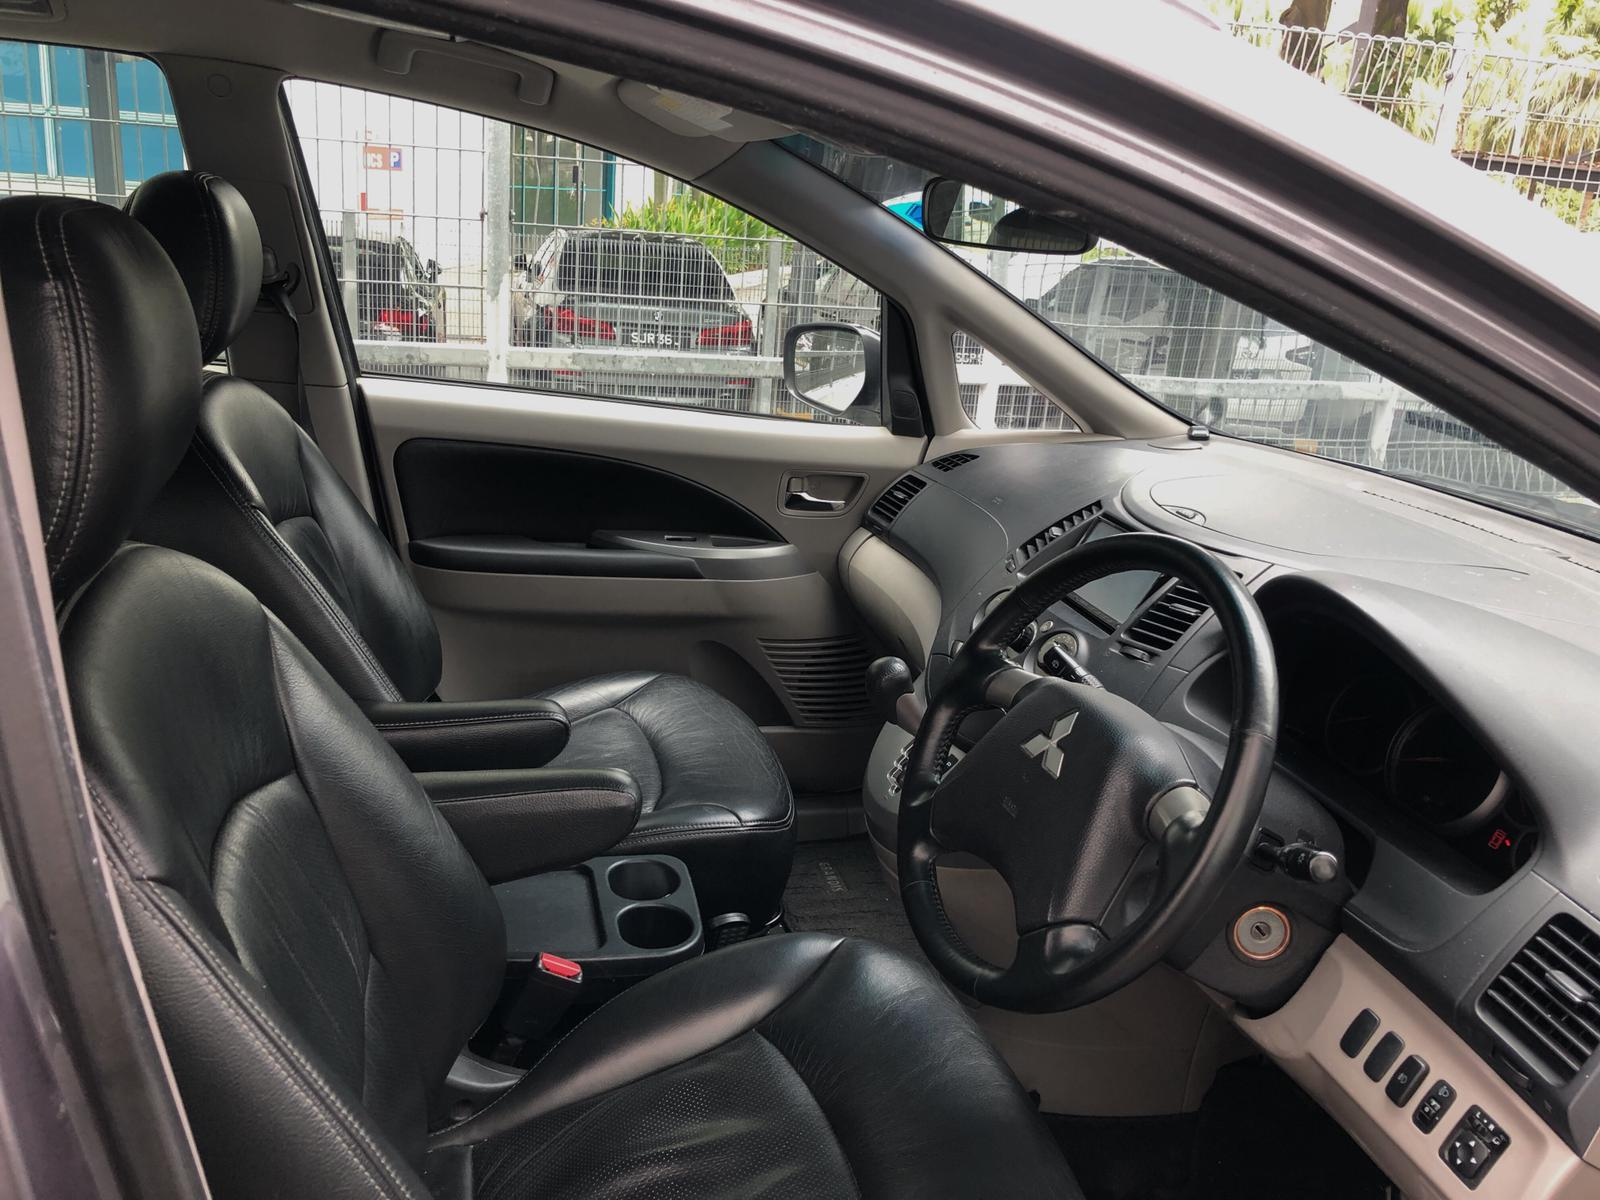 Mitsubishi Grandis 2.4a MPV Grab Rental Gojek Or Personal Use Low price and Cheap Cars Rental